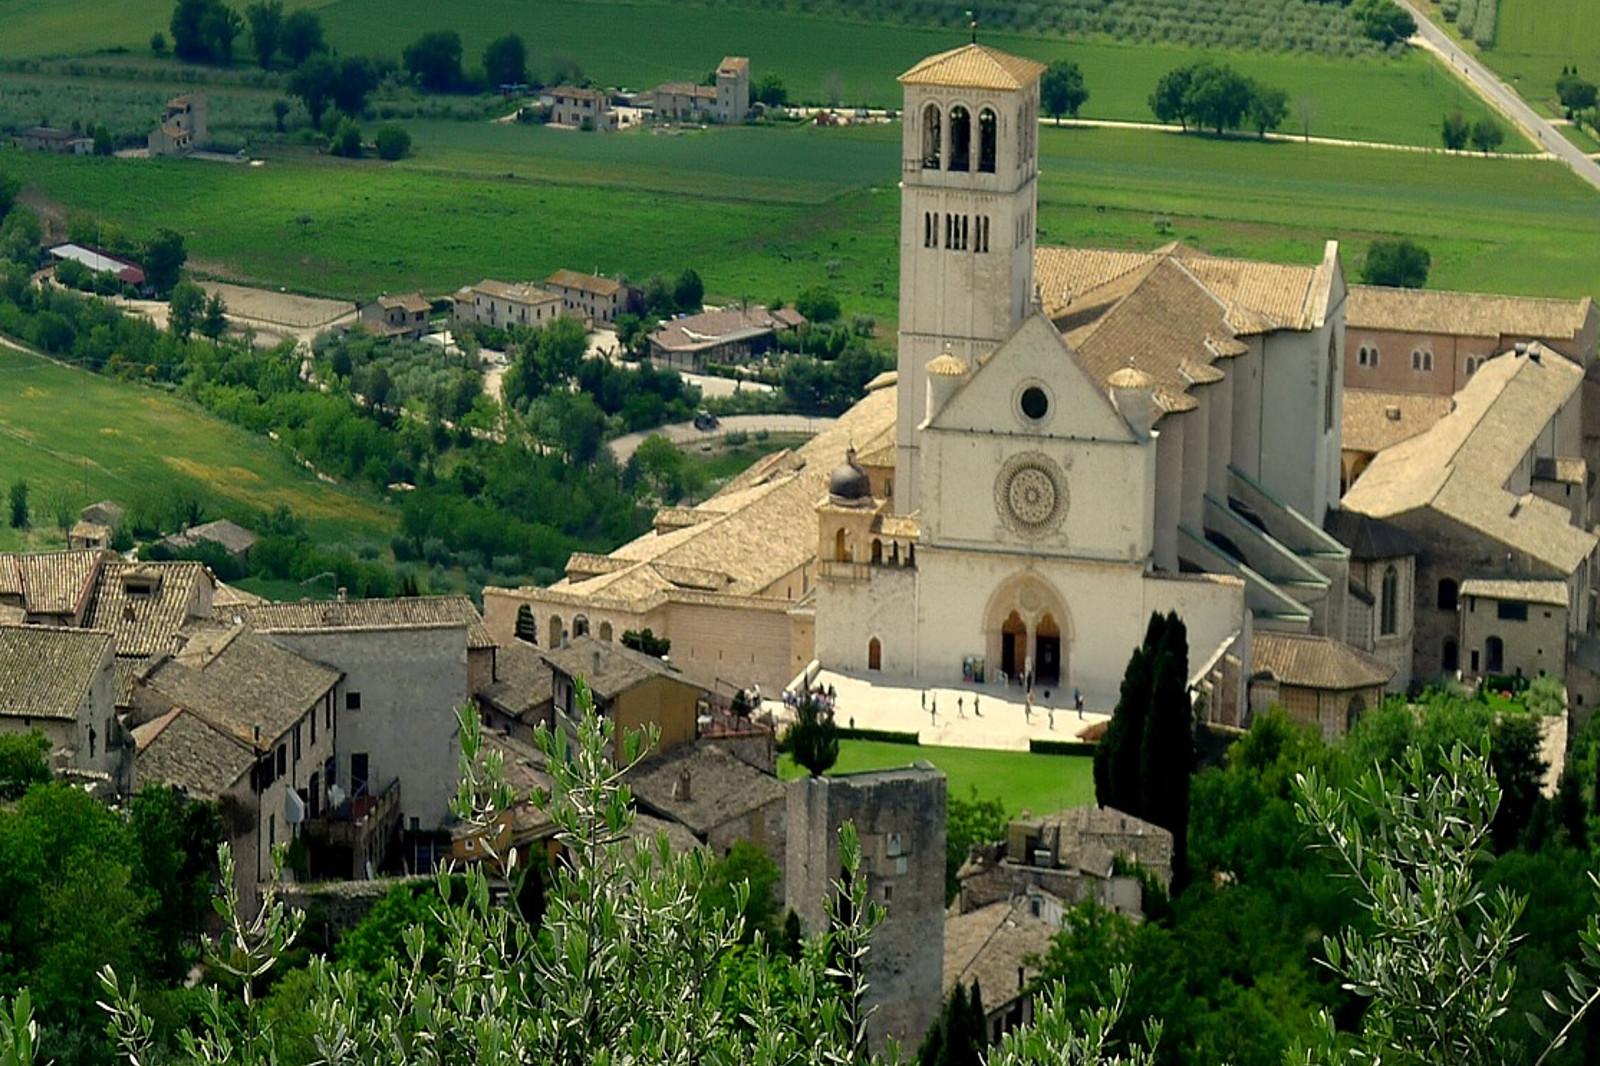 viaggio-assisi-san-francesco-ricciardi-group-agenzia-viaggi-sassari-3